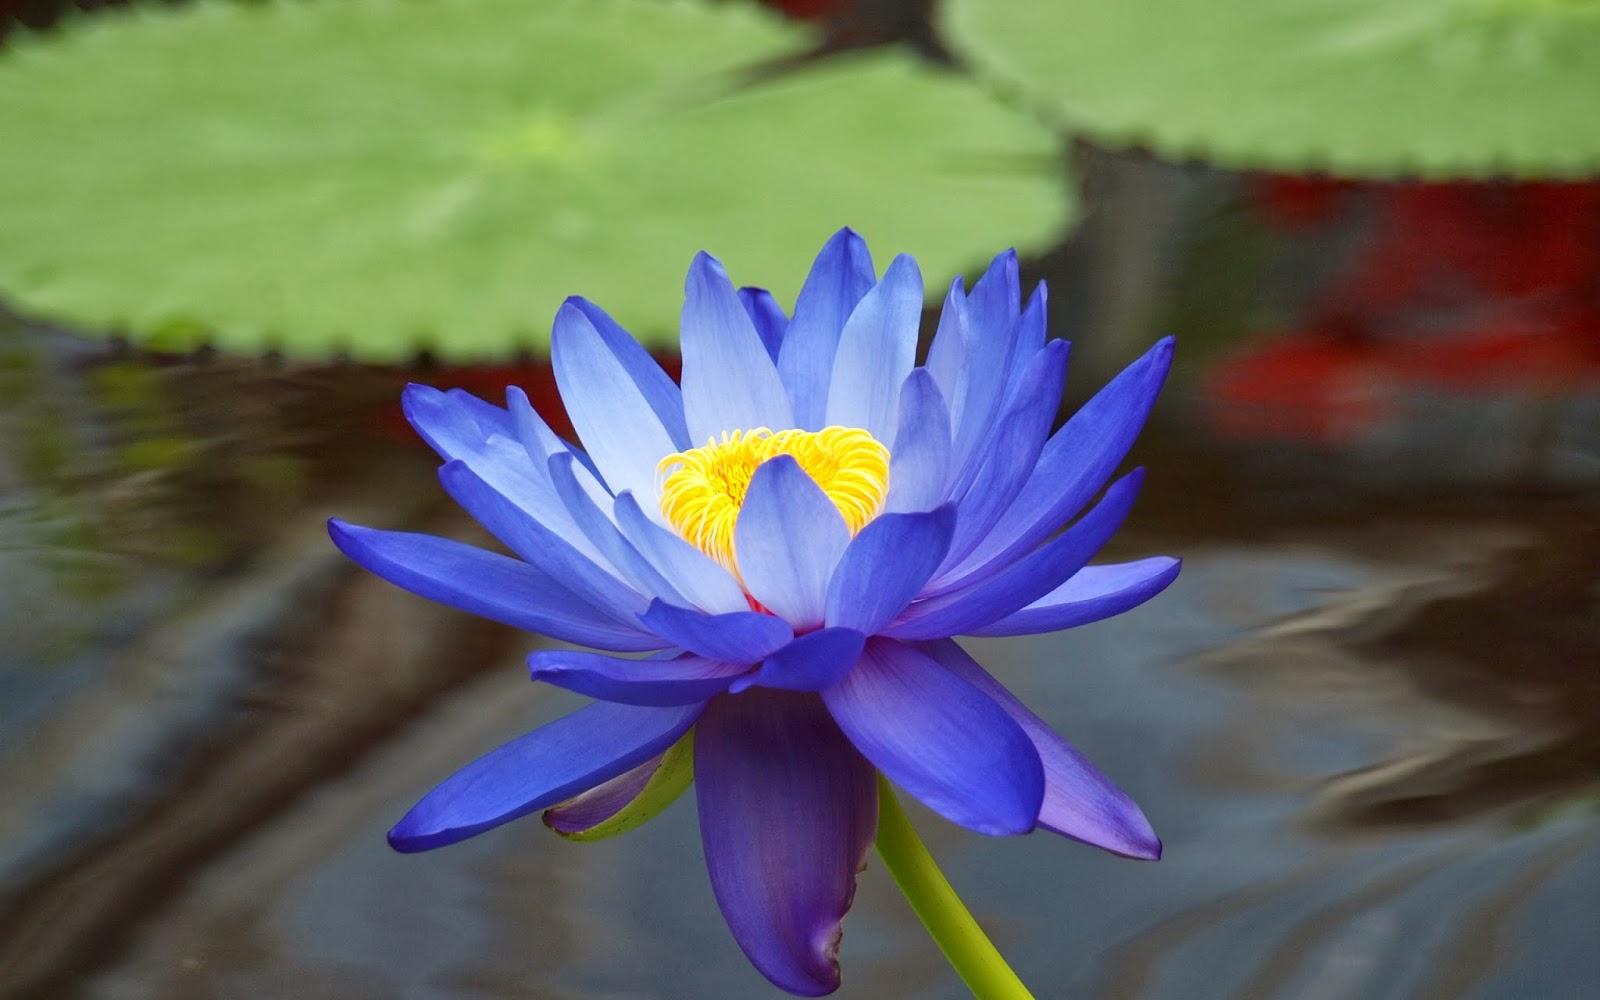 Flores de Loto azul y Lirios de Agua azules